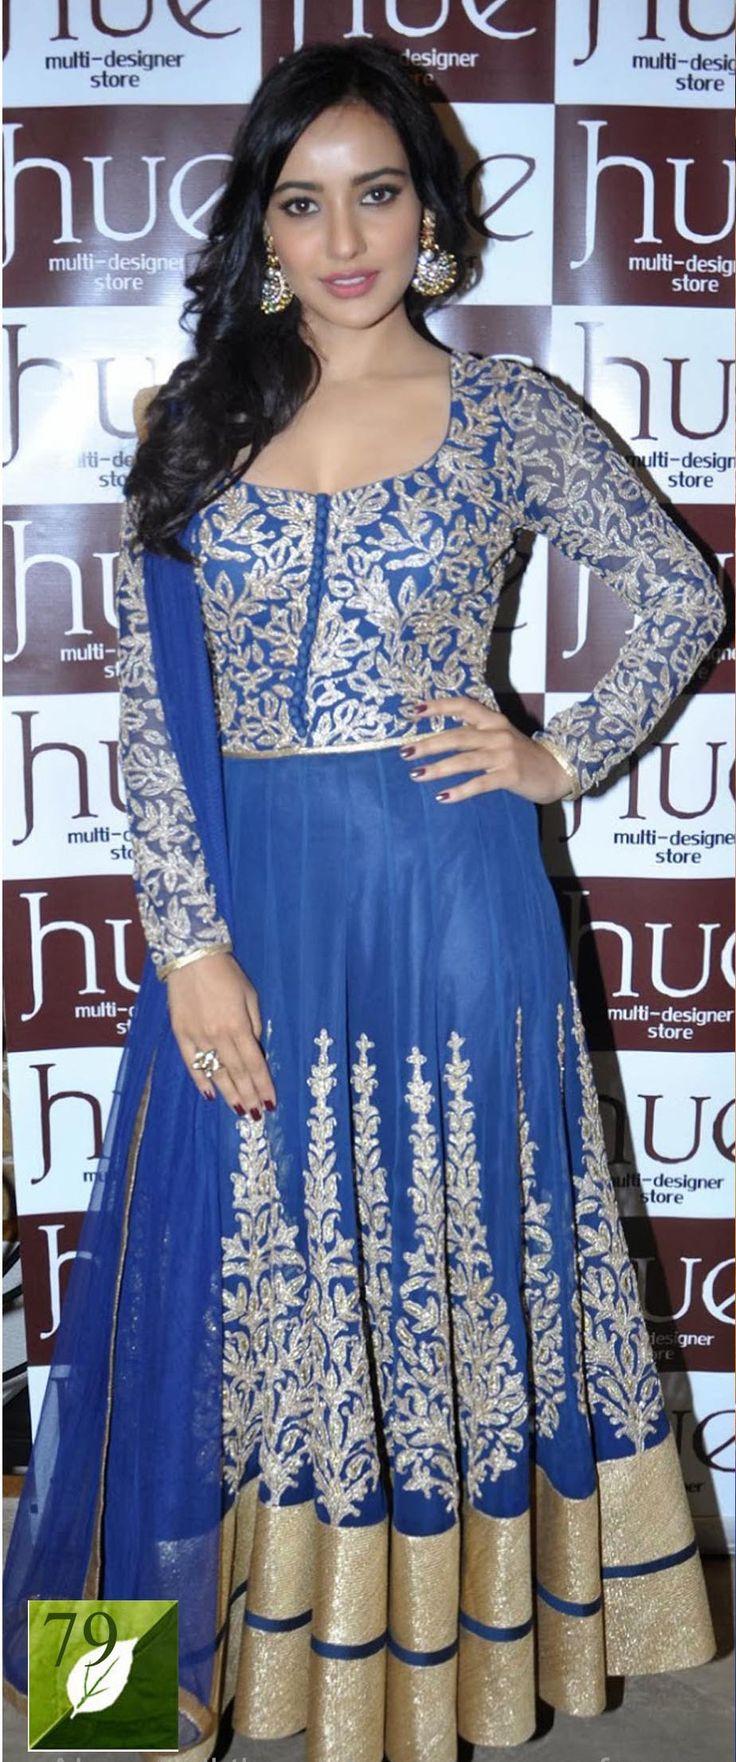 Neha Sharma Net Zari Work Blue & Golden Semi Stitched Bollywood Style Suit - http://member.bulkmart.in/product/neha-sharma-net-zari-work-blue-golden-semi-stitched-bollywood-style-suit/